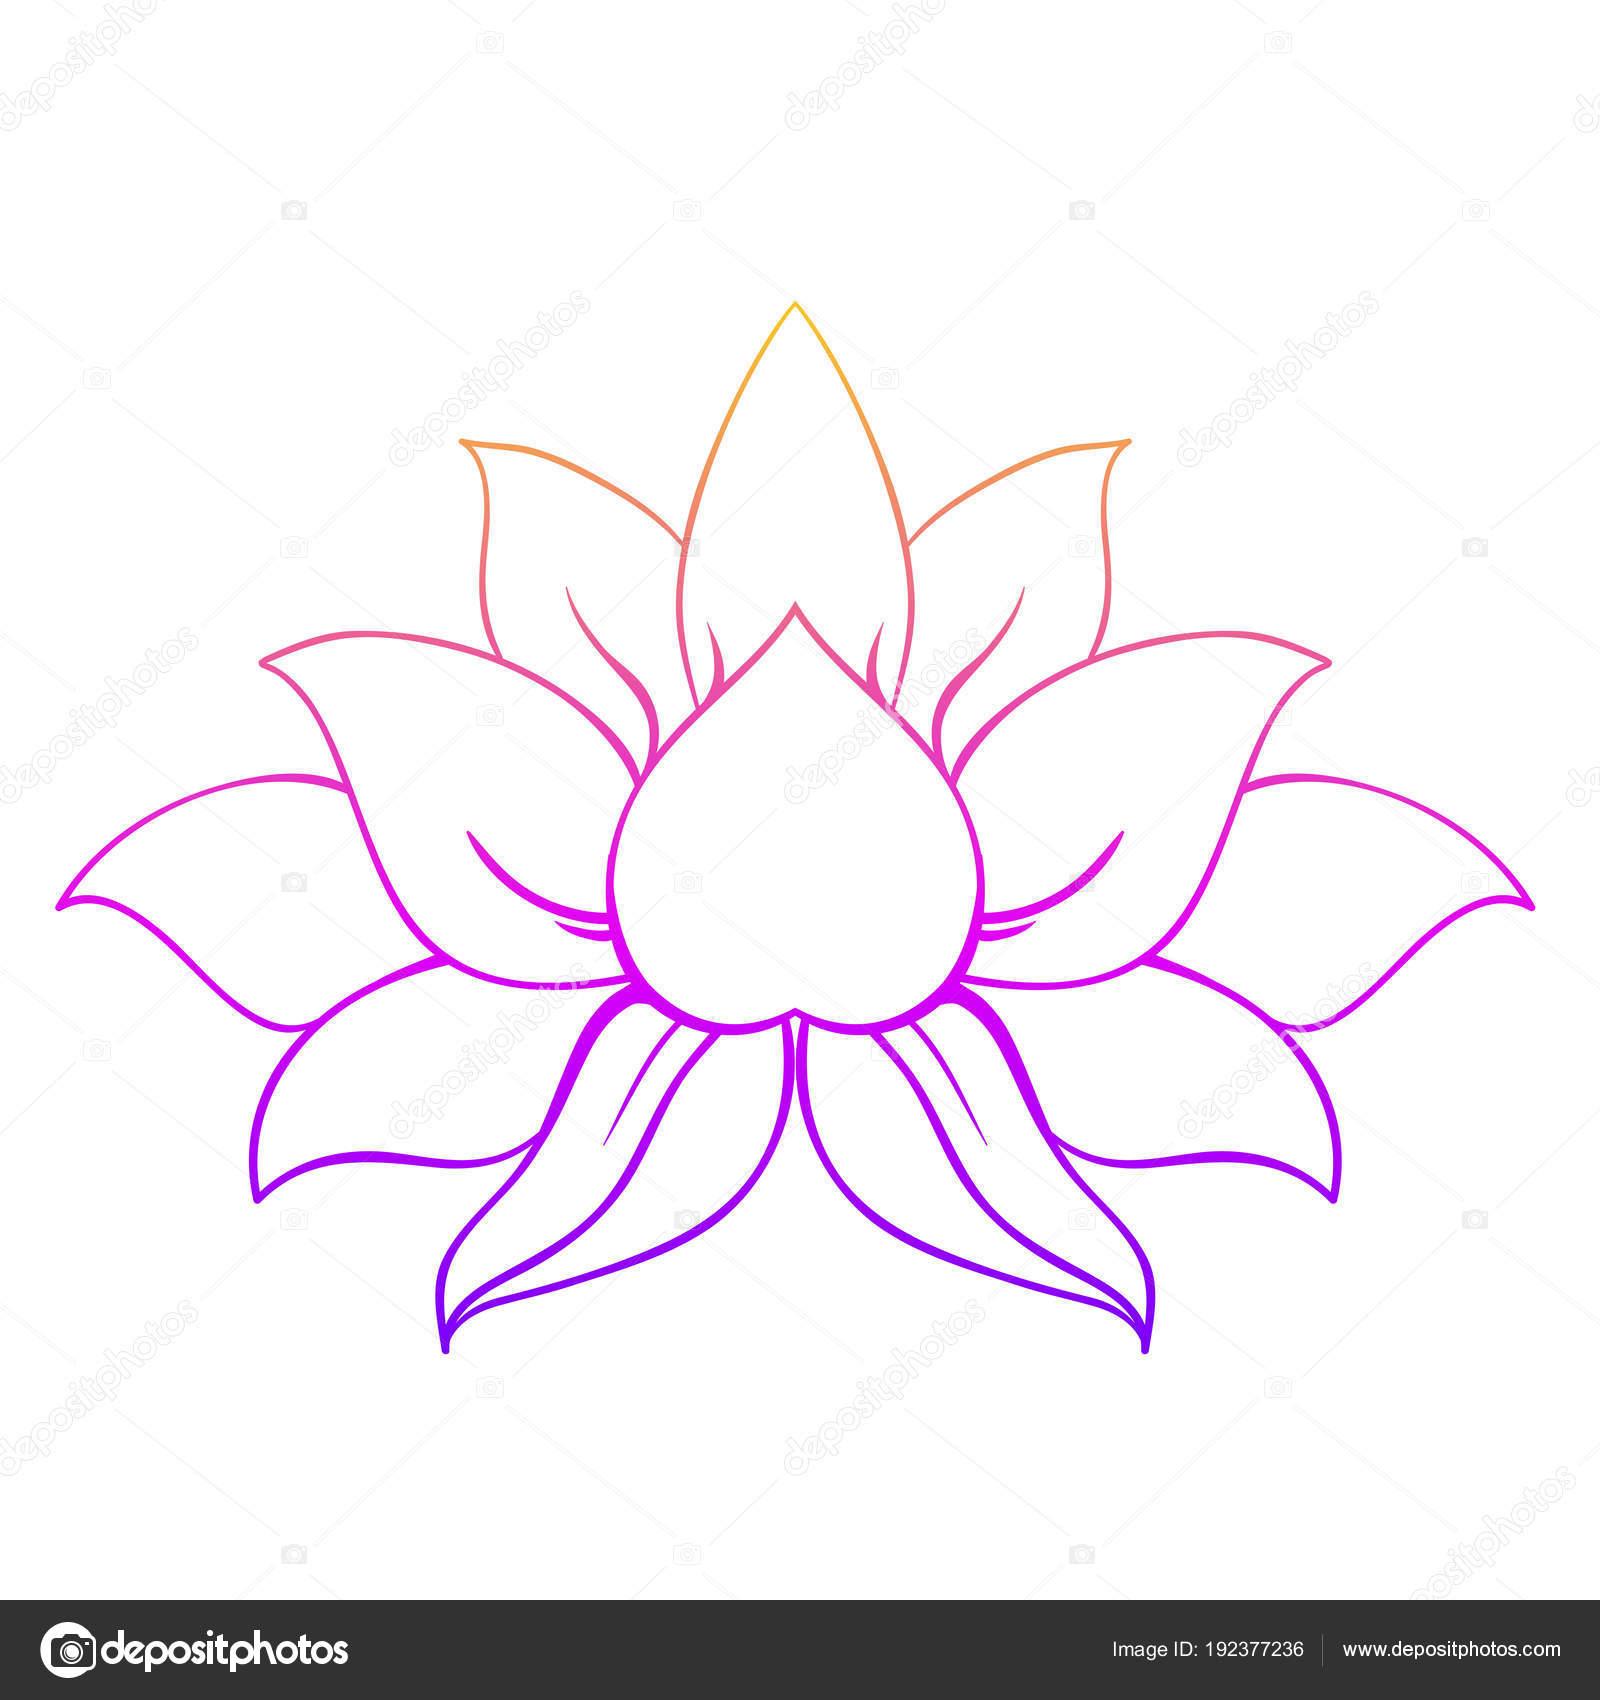 Decorative ornamental lotus flower symbol stock vector vgorbash decorative ornamental lotus flower symbol stock vector mightylinksfo